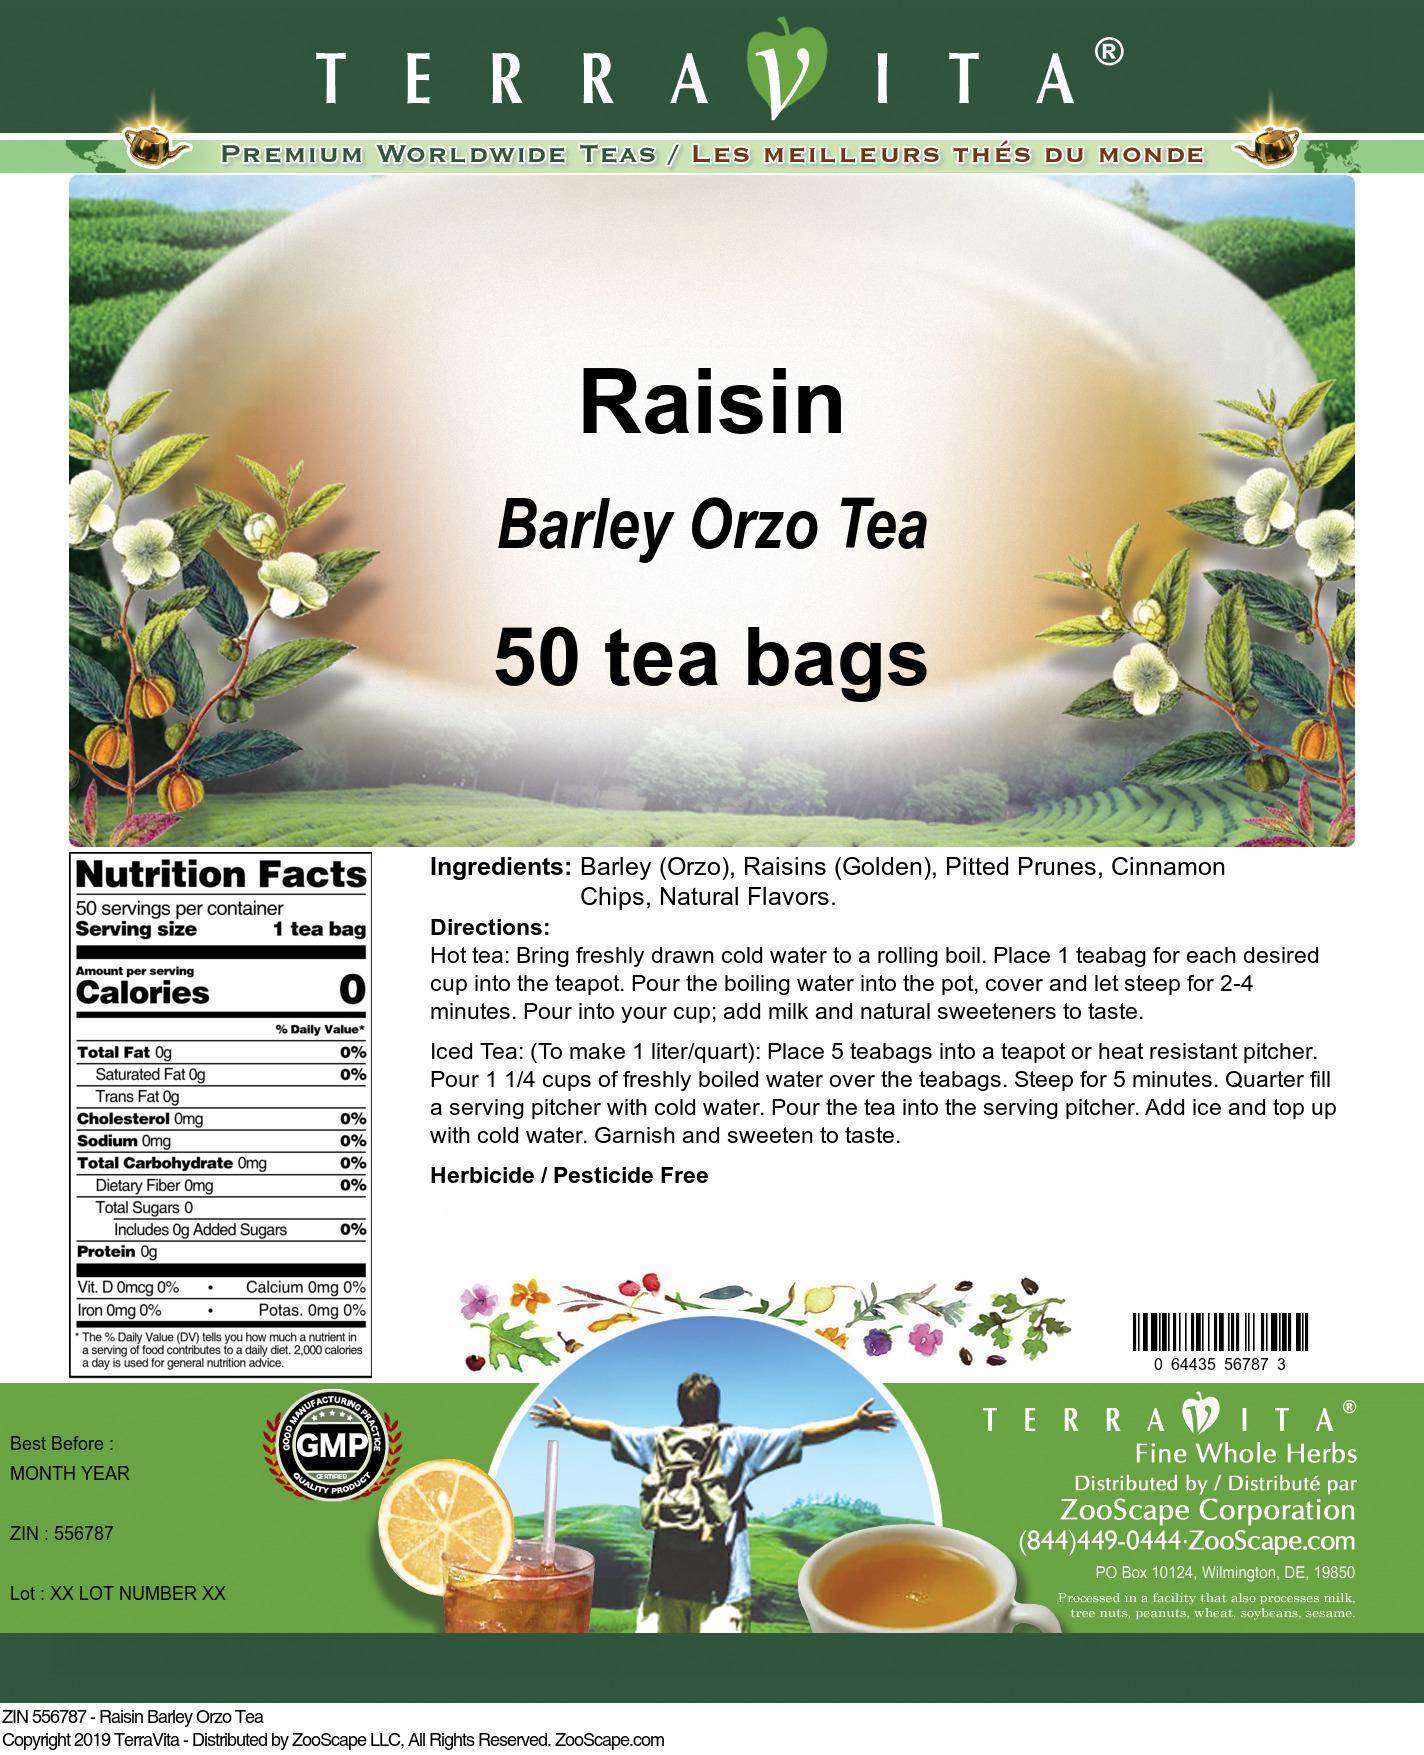 Raisin Barley Orzo Tea